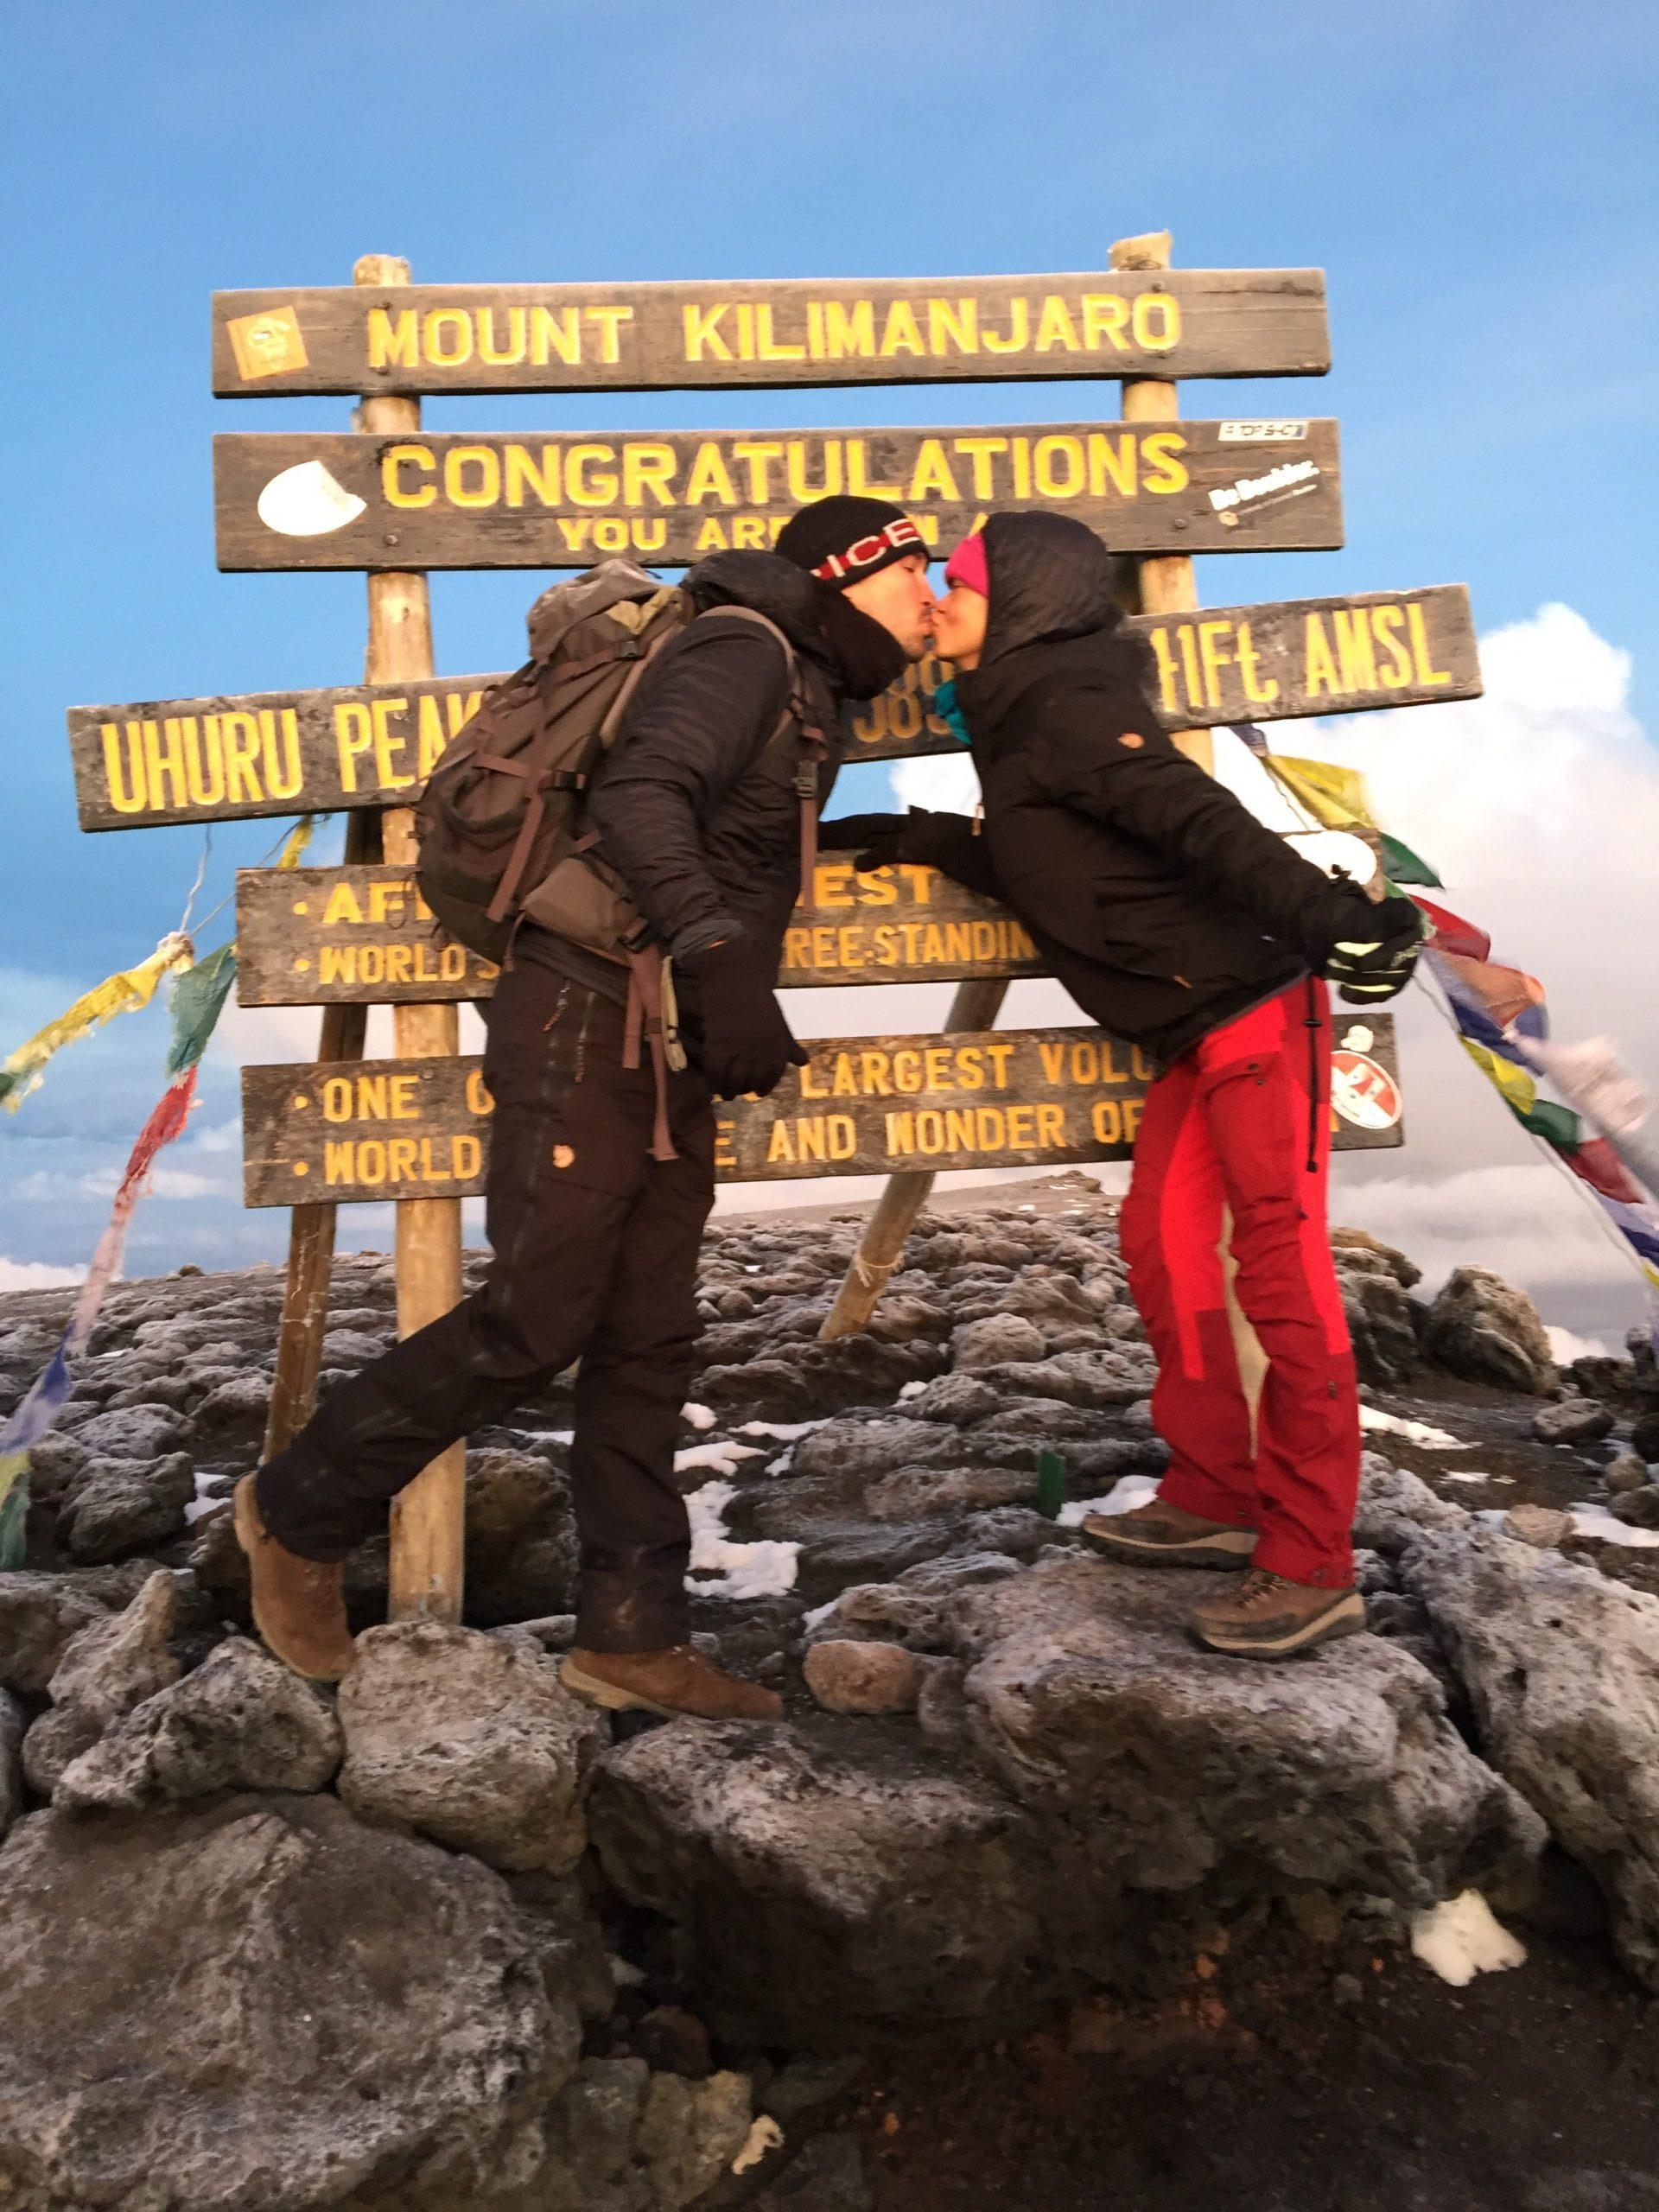 Kilimanjaro Honeymoon